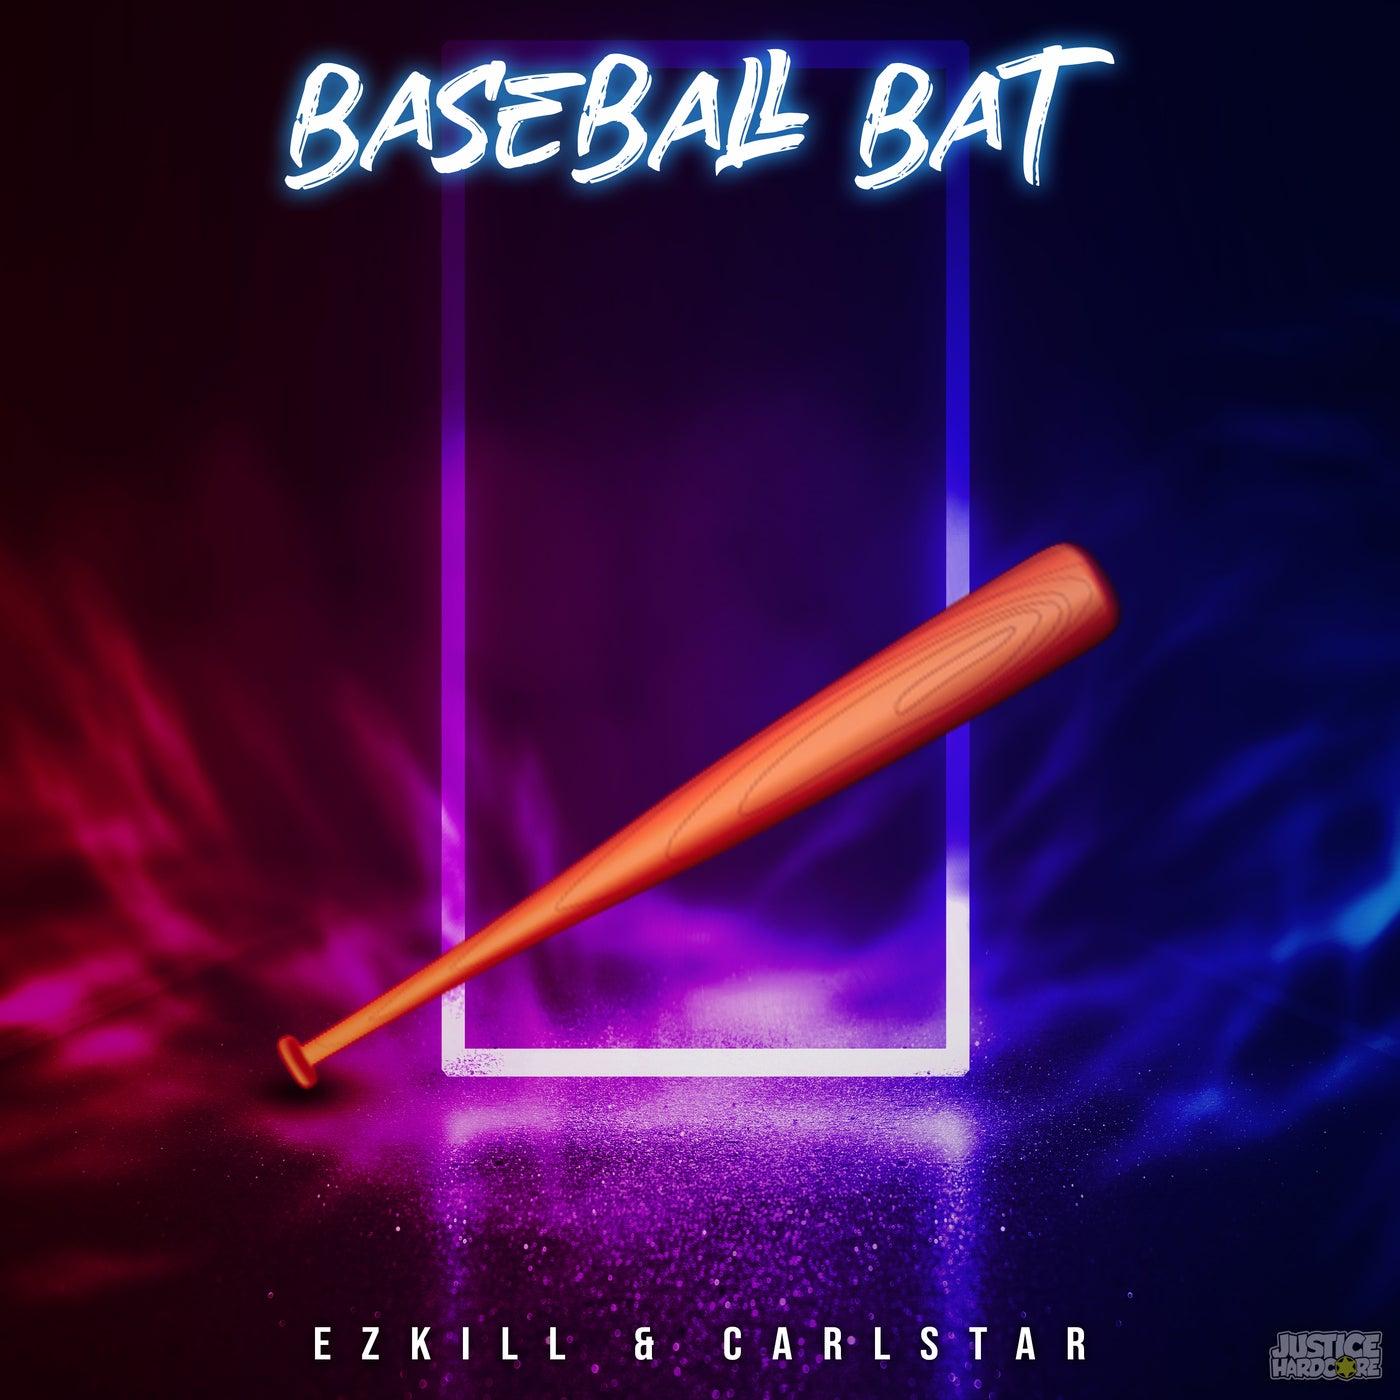 Baseball Bat (Original Mix)